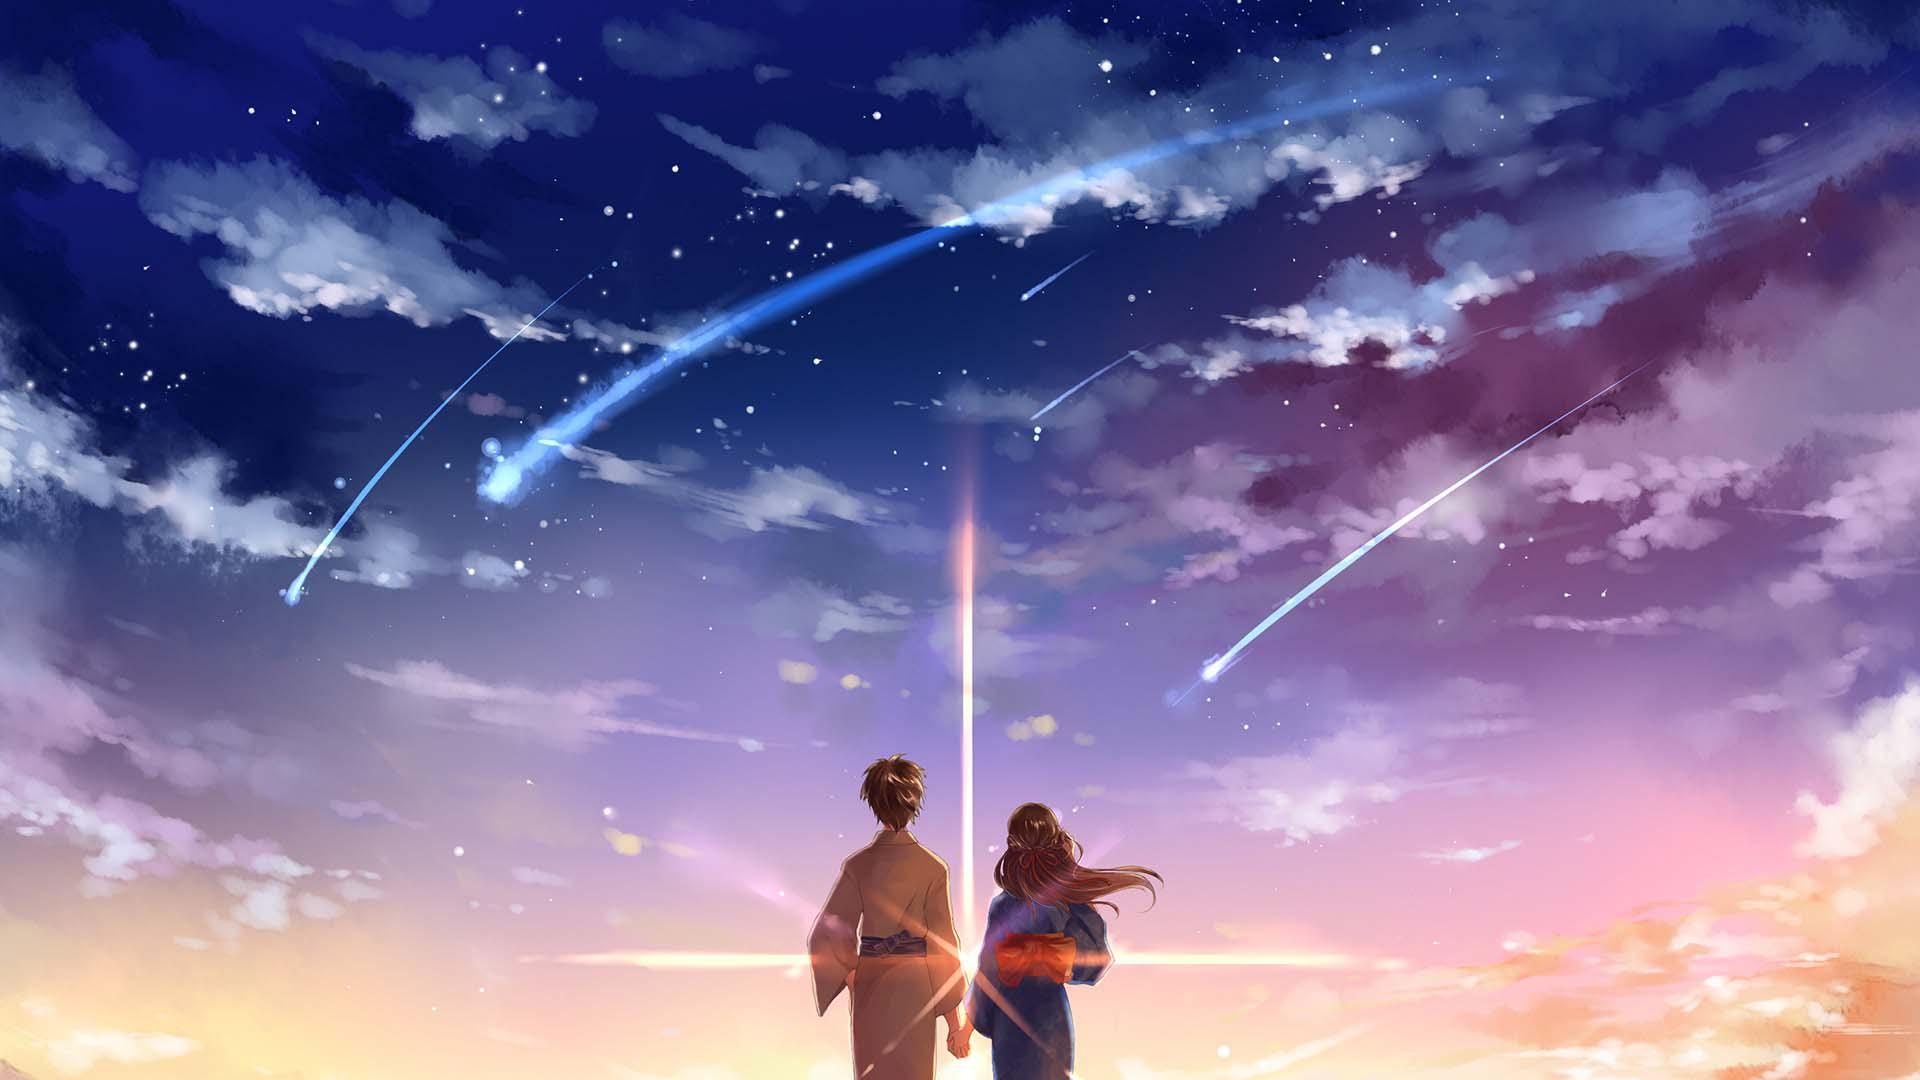 Anime galaxy đôi đẹp